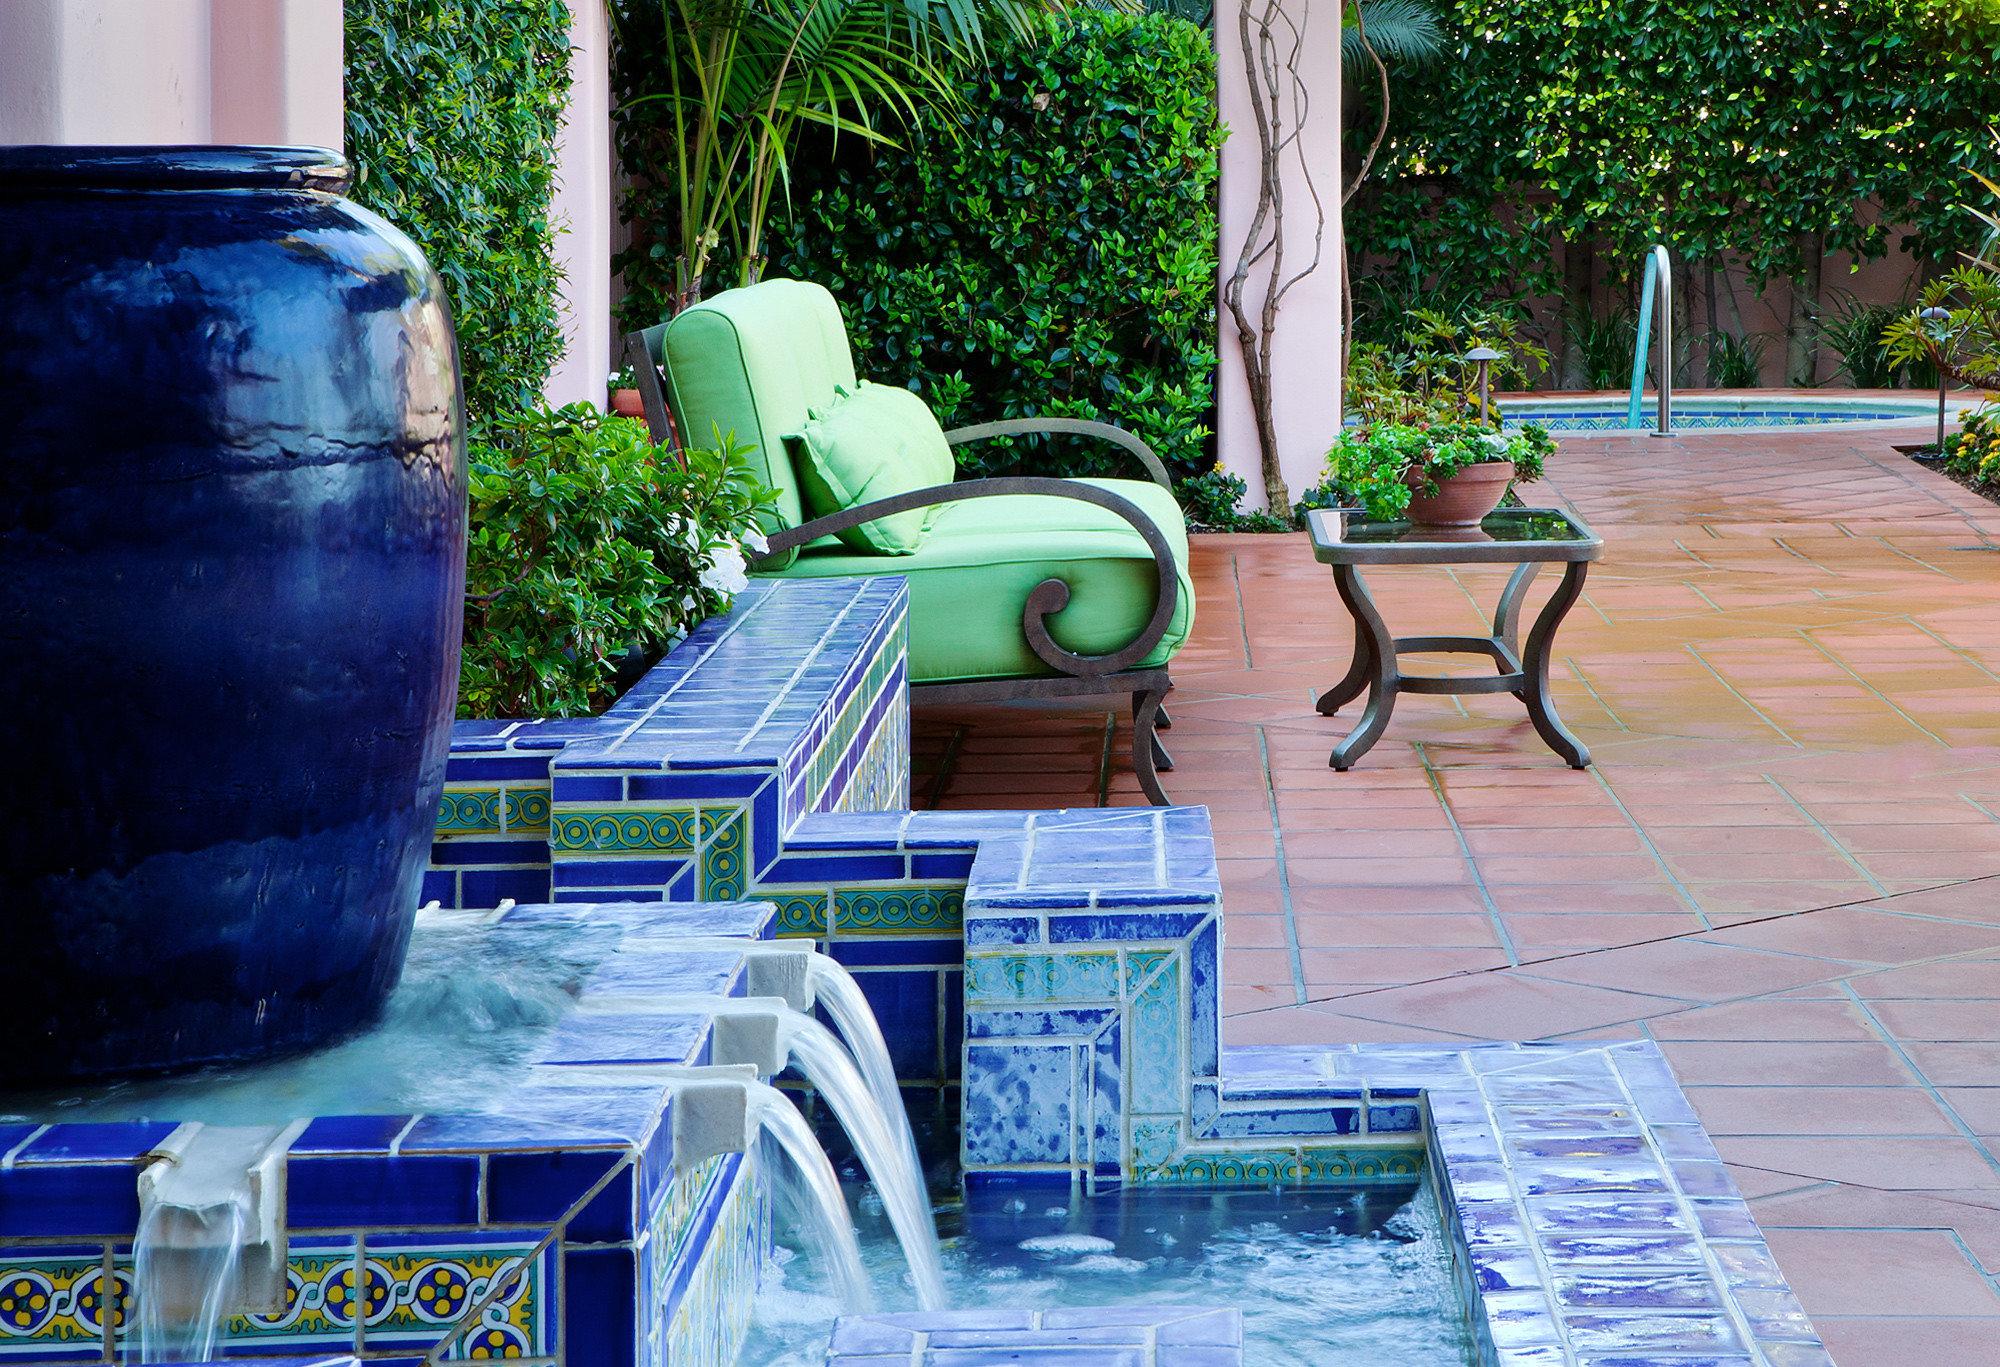 Elegant Hot tub Hot tub/Jacuzzi Luxury Patio Terrace tree leisure swimming pool backyard